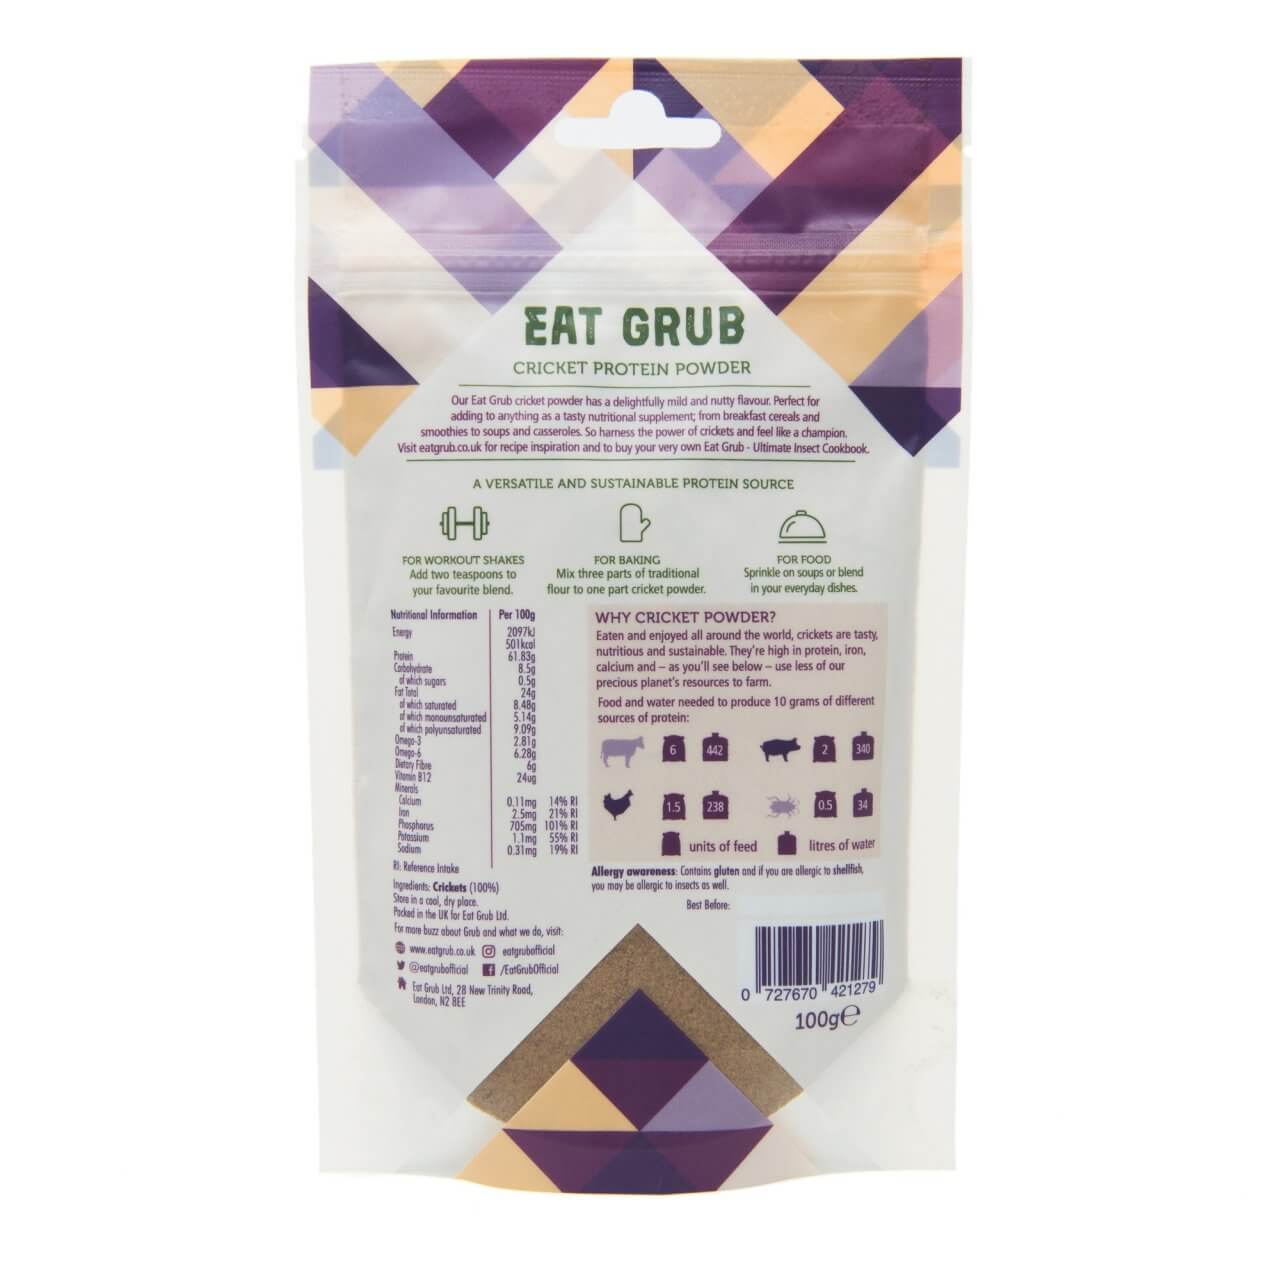 Eat Grub 100%ナチュラル クリケットプロテインパウダー(食用コオロギパウダー) 100g